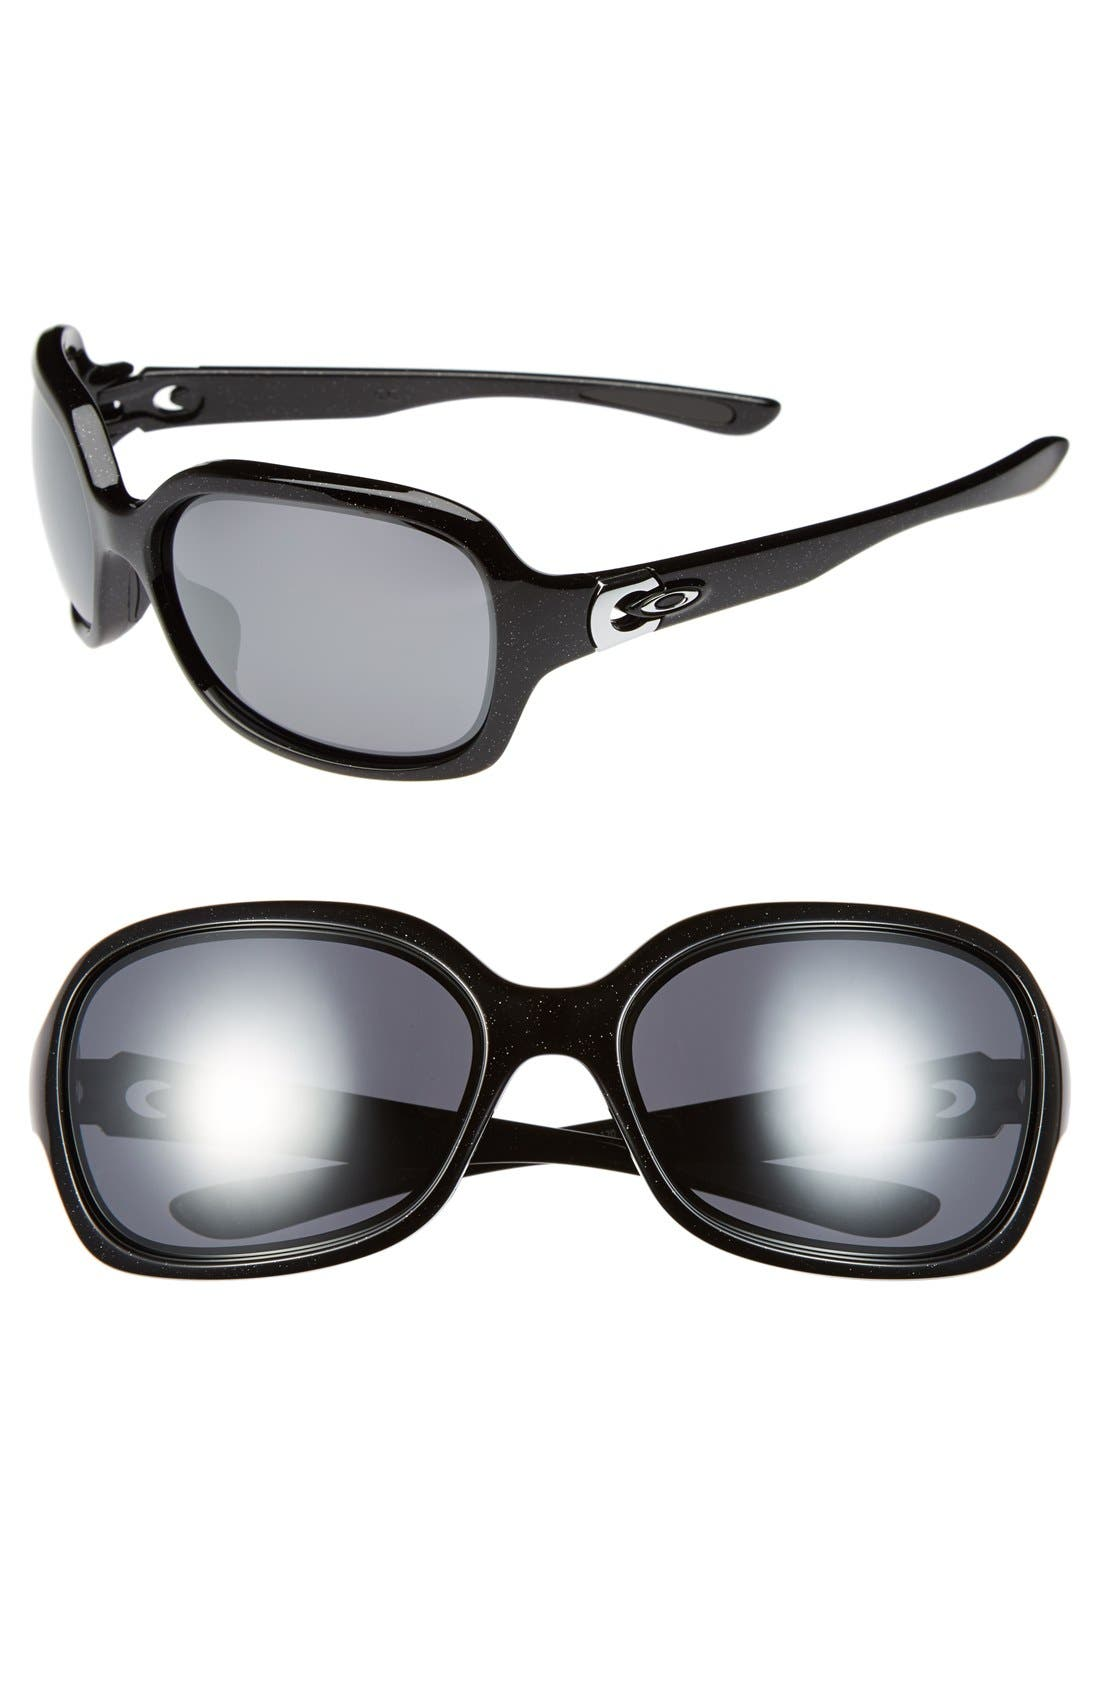 Alternate Image 1 Selected - Oakley 'Pulse' 61mm Sunglasses